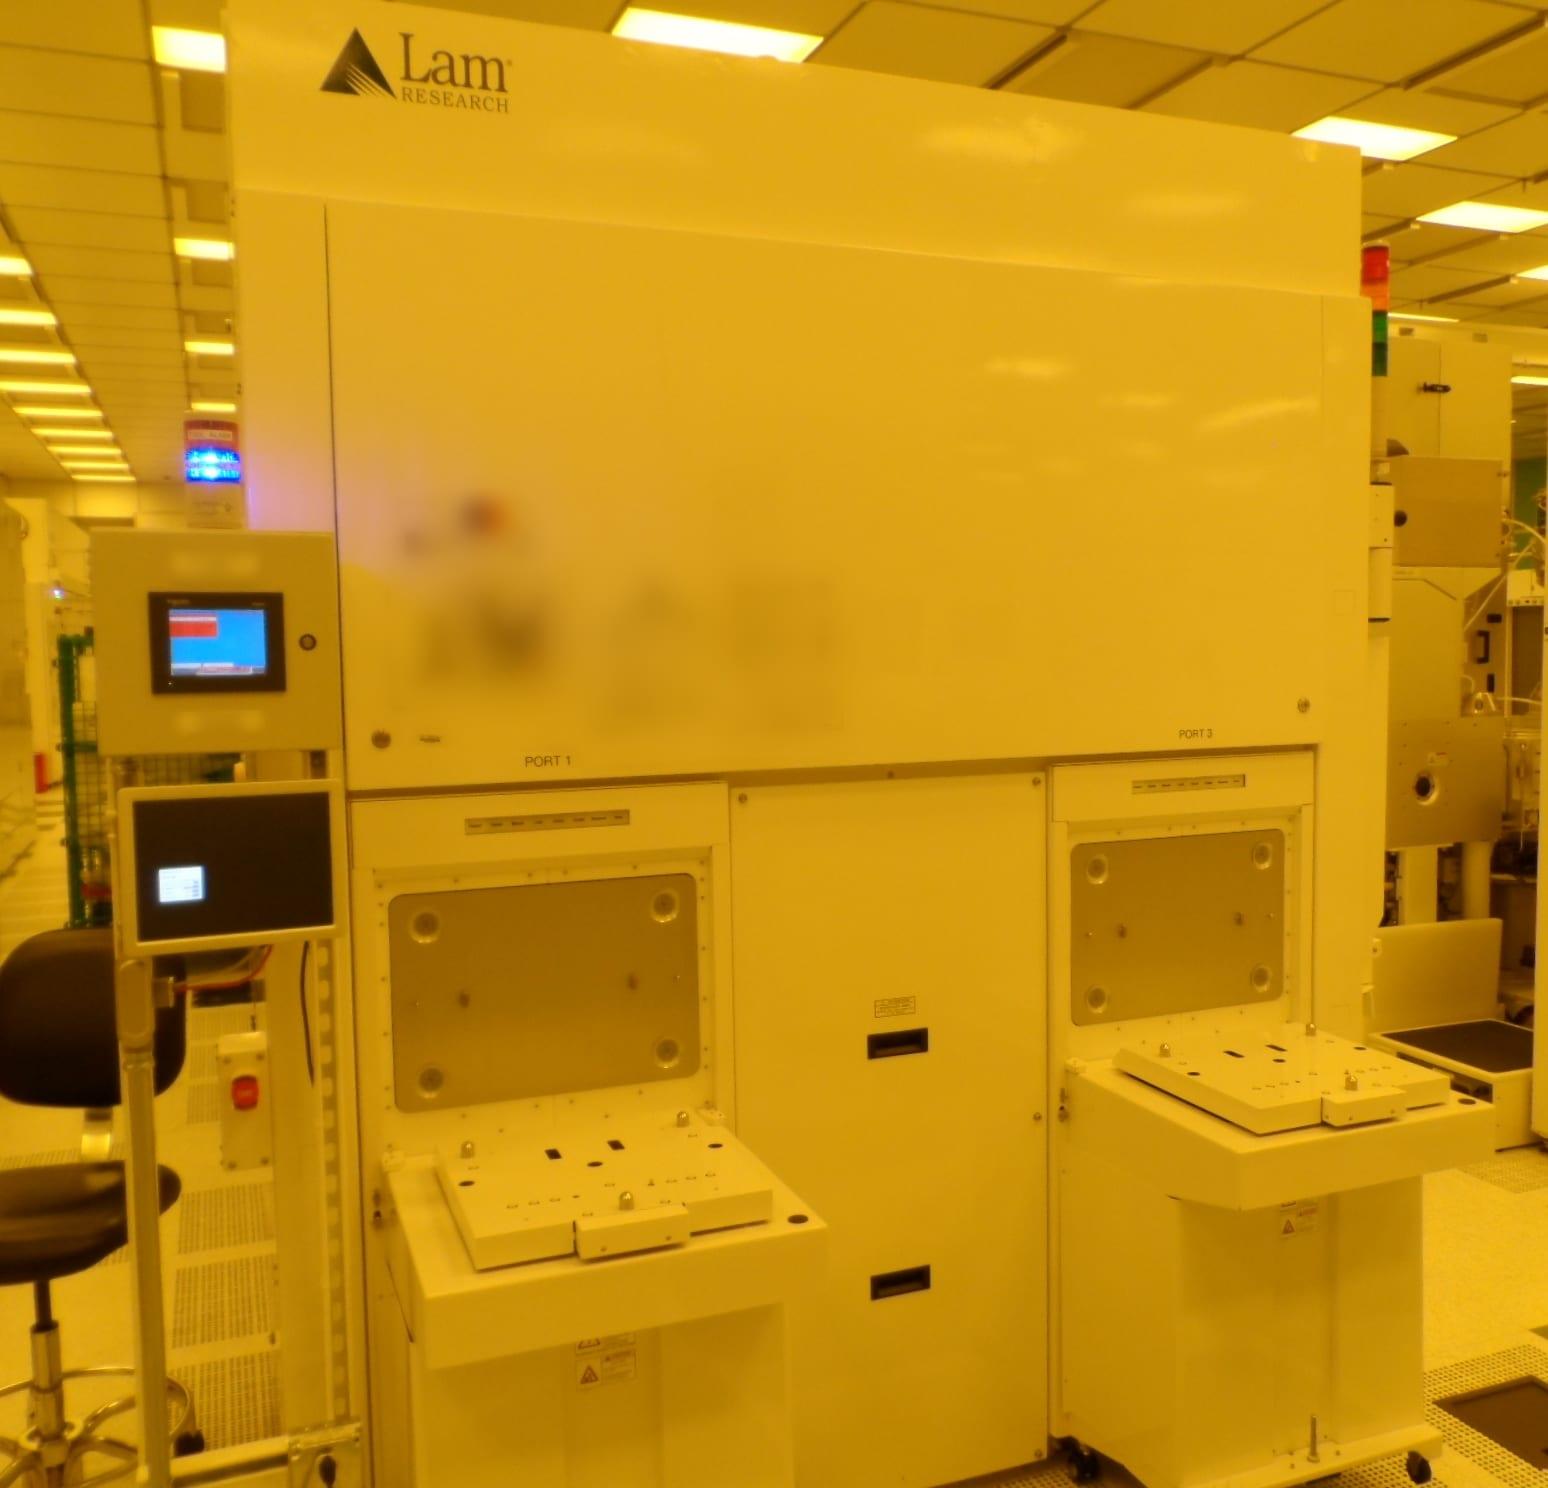 Lam Altus W Chemical Vapor Deposition Cvd System 31508